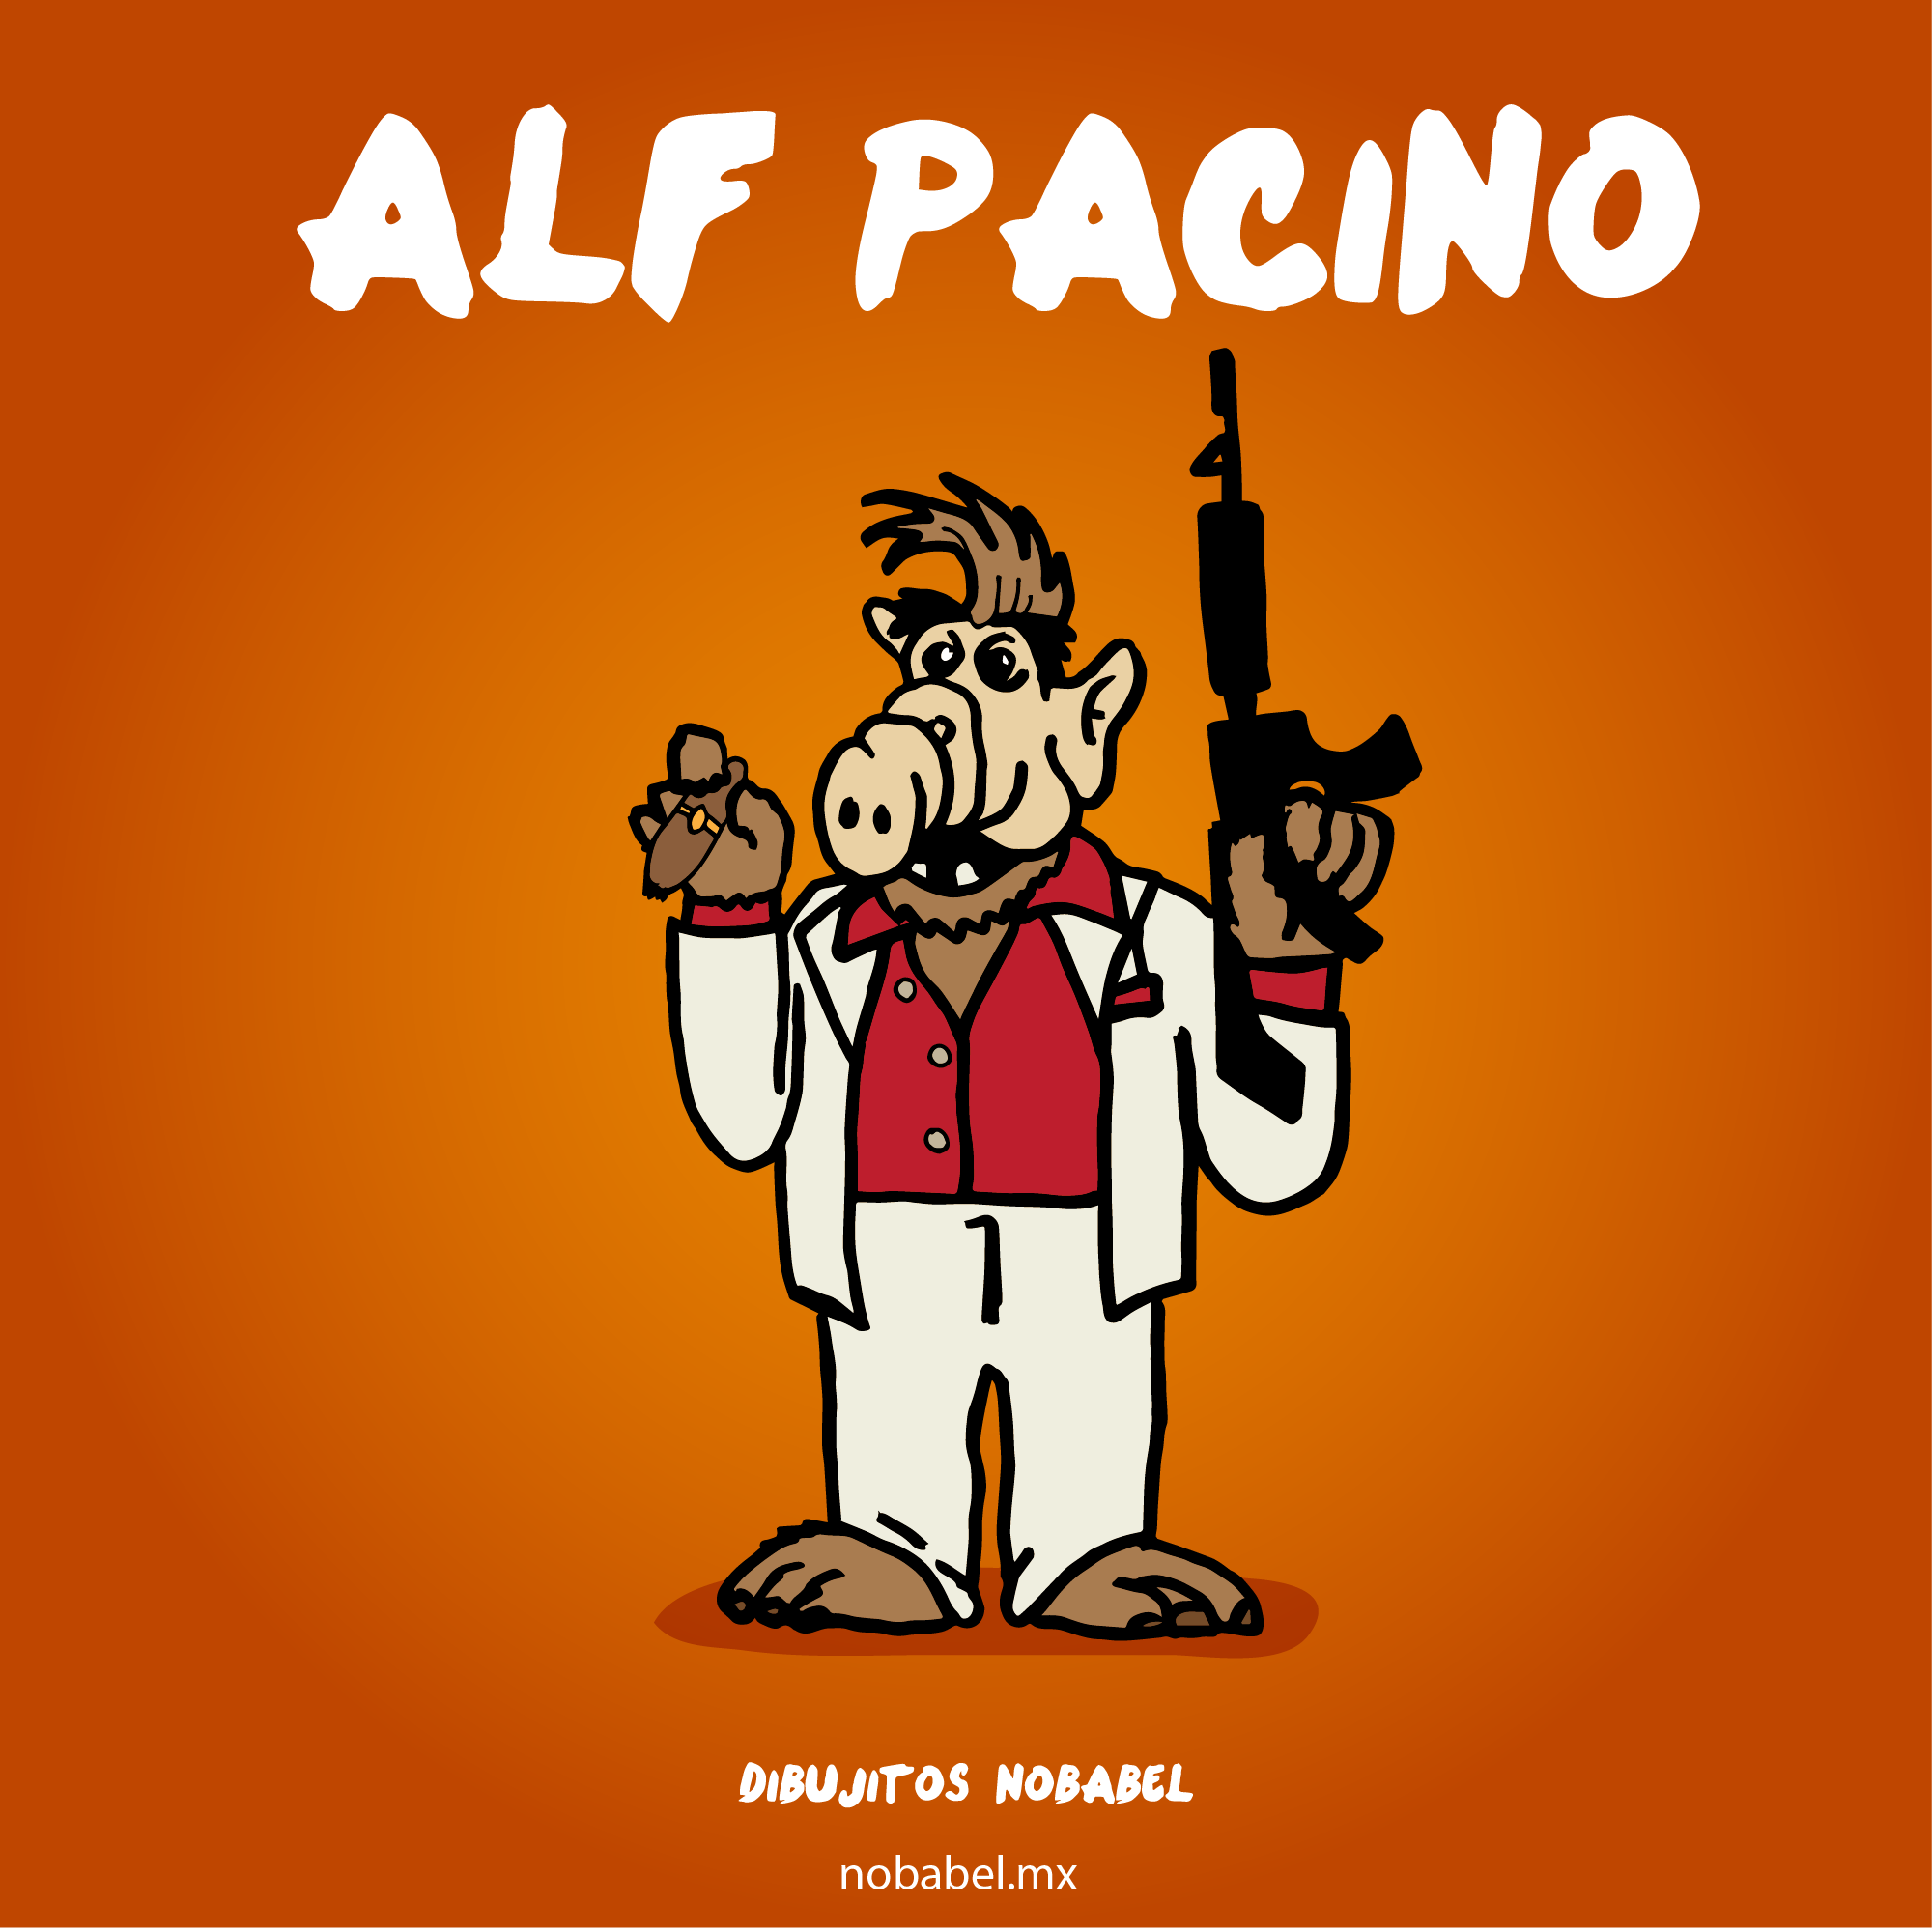 Alf Quotes Alf Pacino  Nobabel  Pinterest  Humor